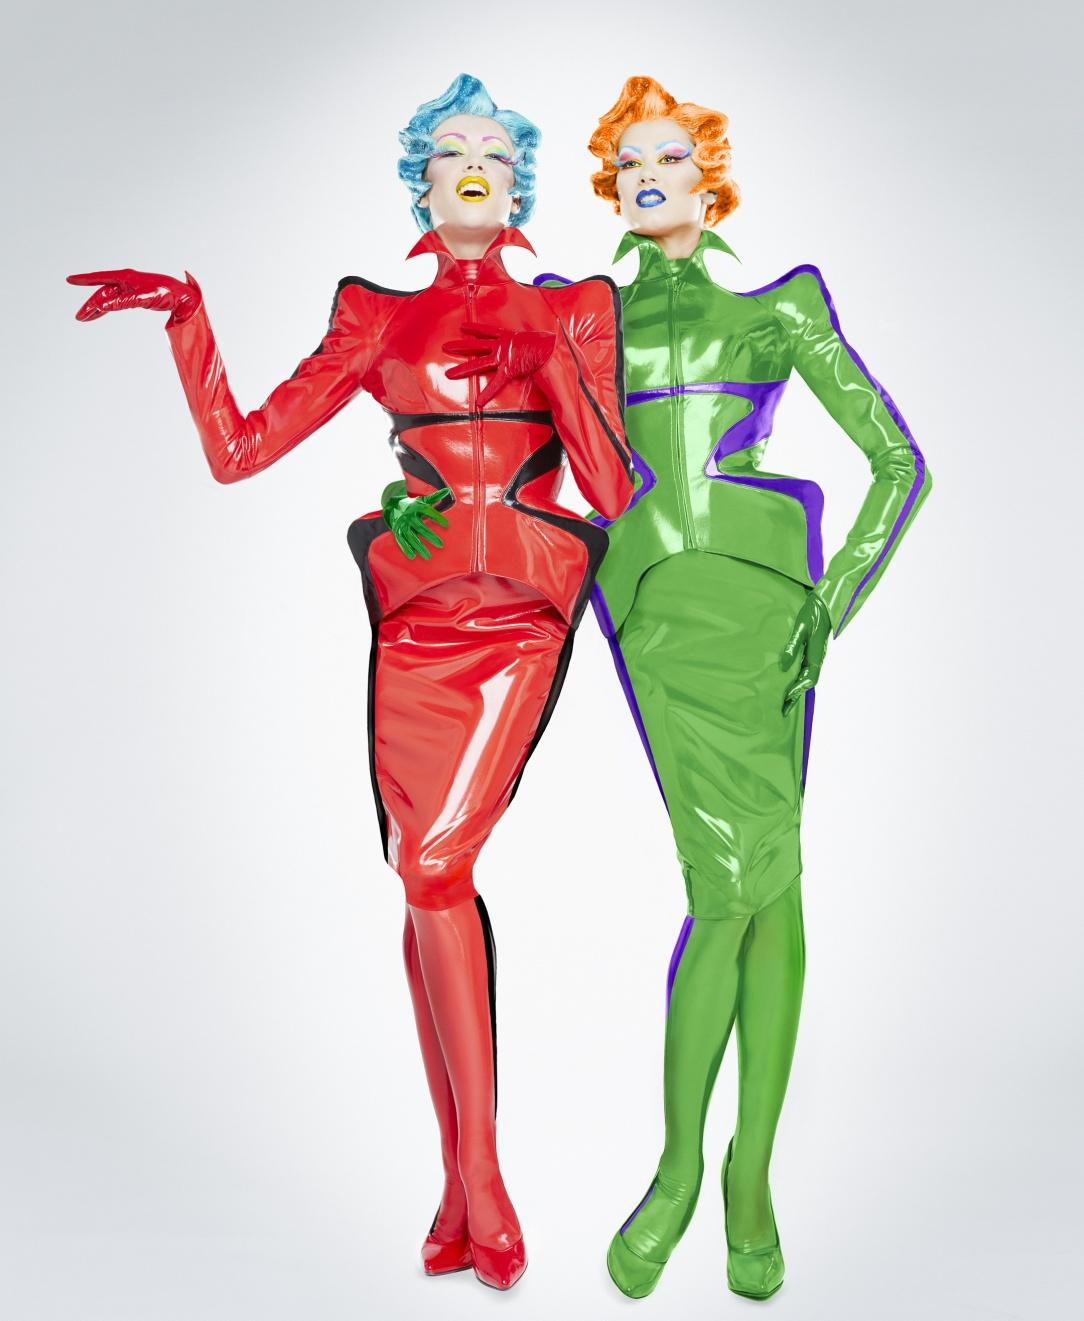 4. Christian Gautier, stage costumes for the show Mugler Follies, 2013. Photo Christian Gautier, Manfred Mugler. Outfits Thierry Mugler..jpg